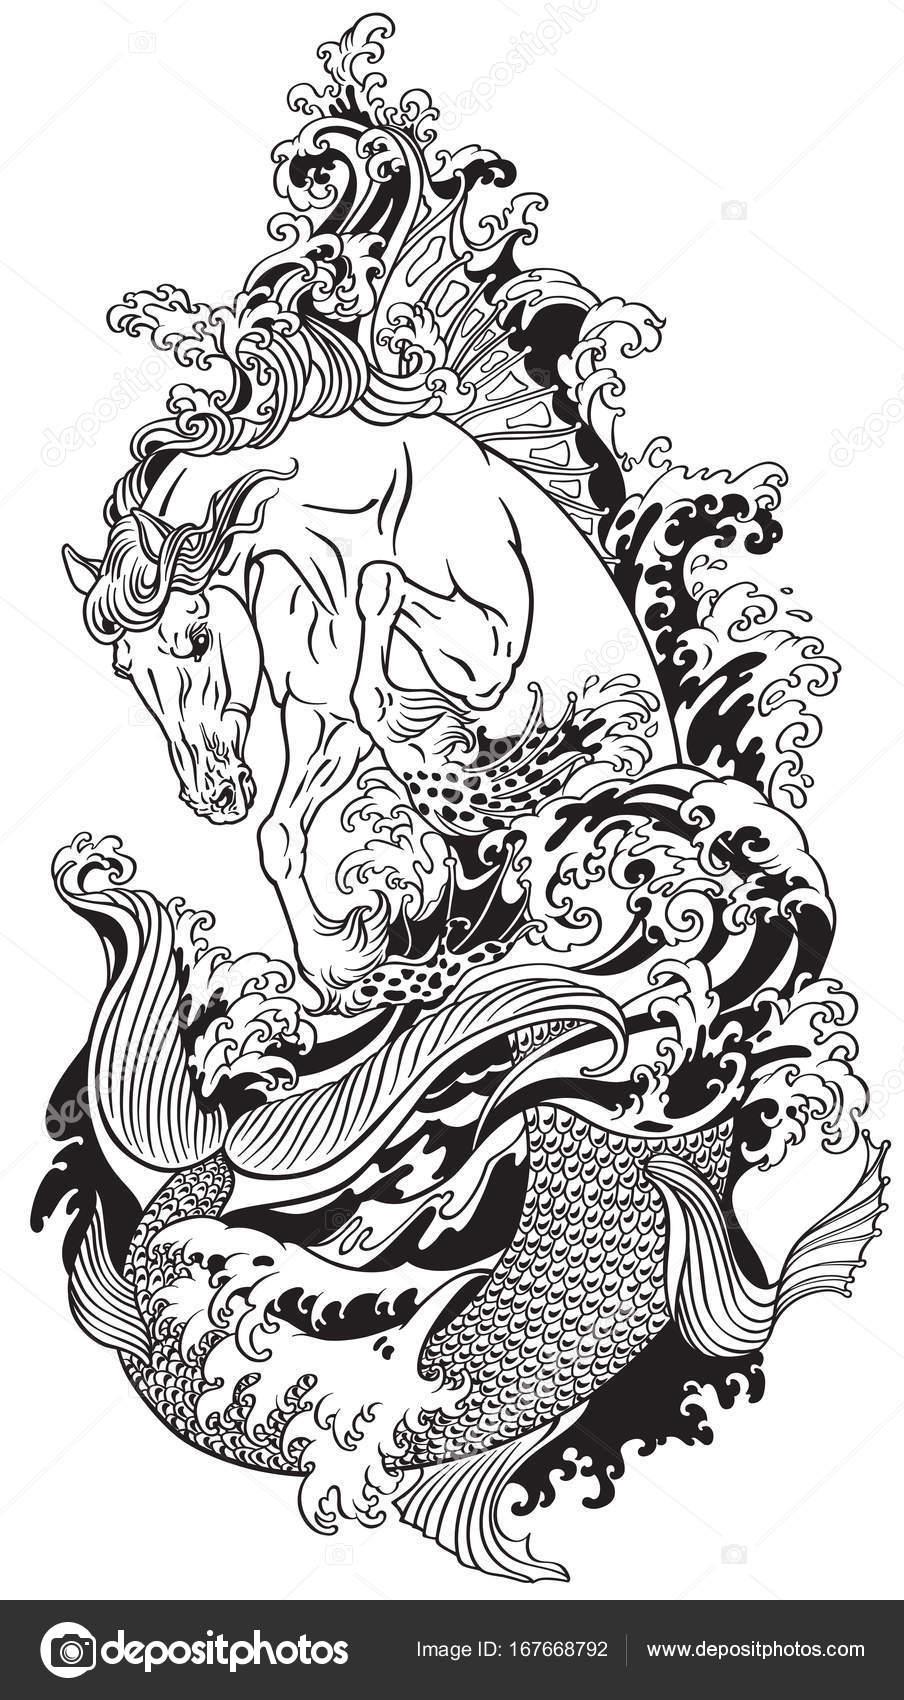 Mythological Sea Horse Hippocampus Stock Vector C Insima 167668792